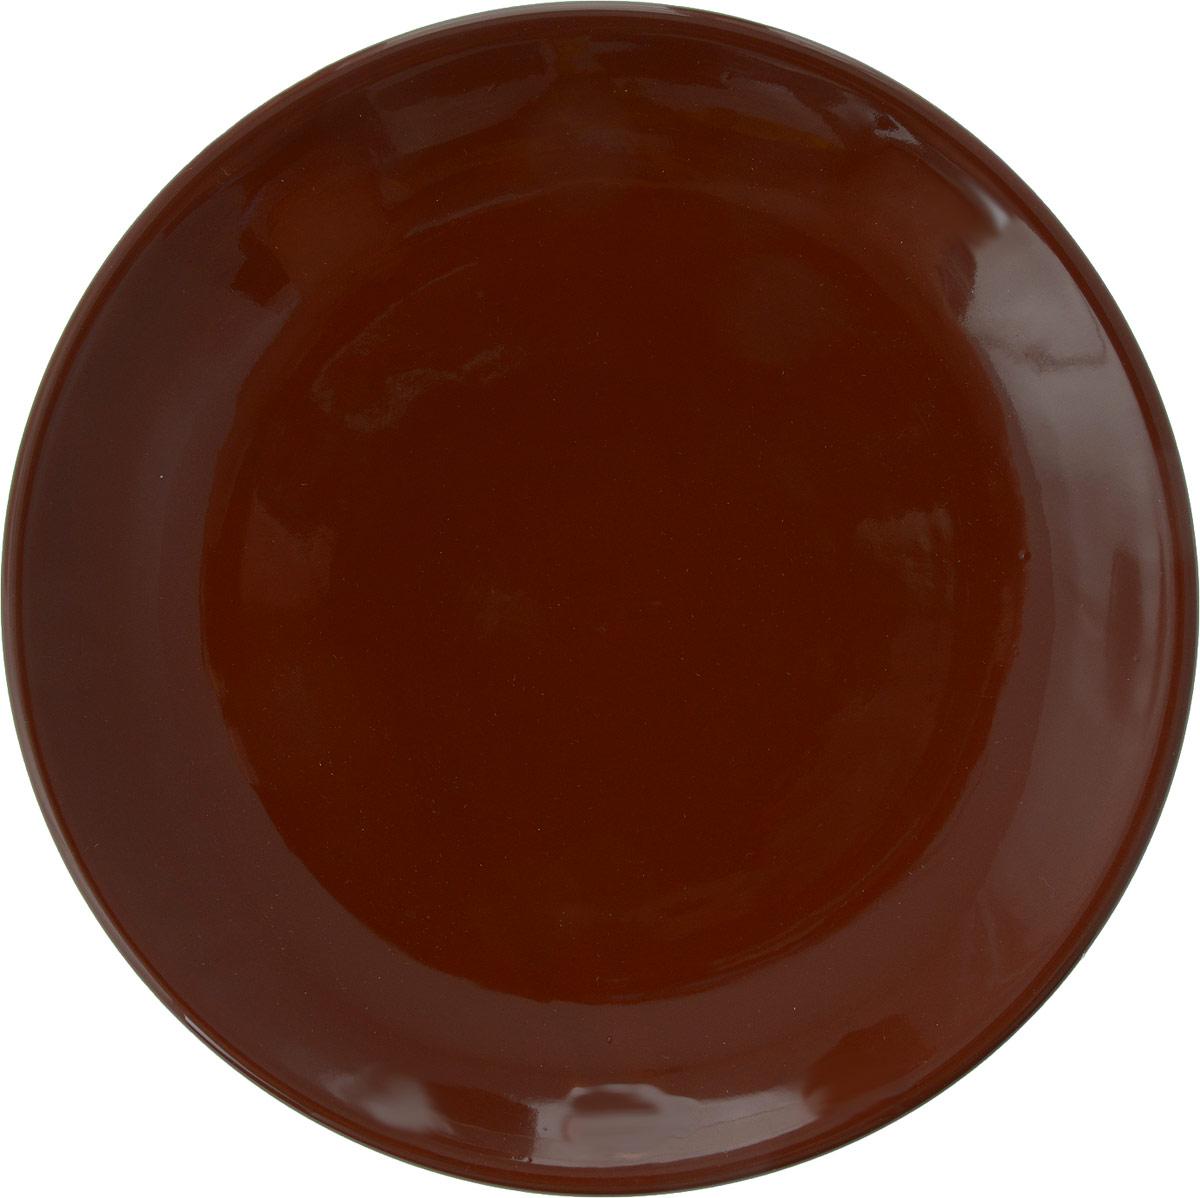 "Тарелка Борисовская керамика ""Cтандарт"", цвет: темно-коричневый, диаметр 23 см"